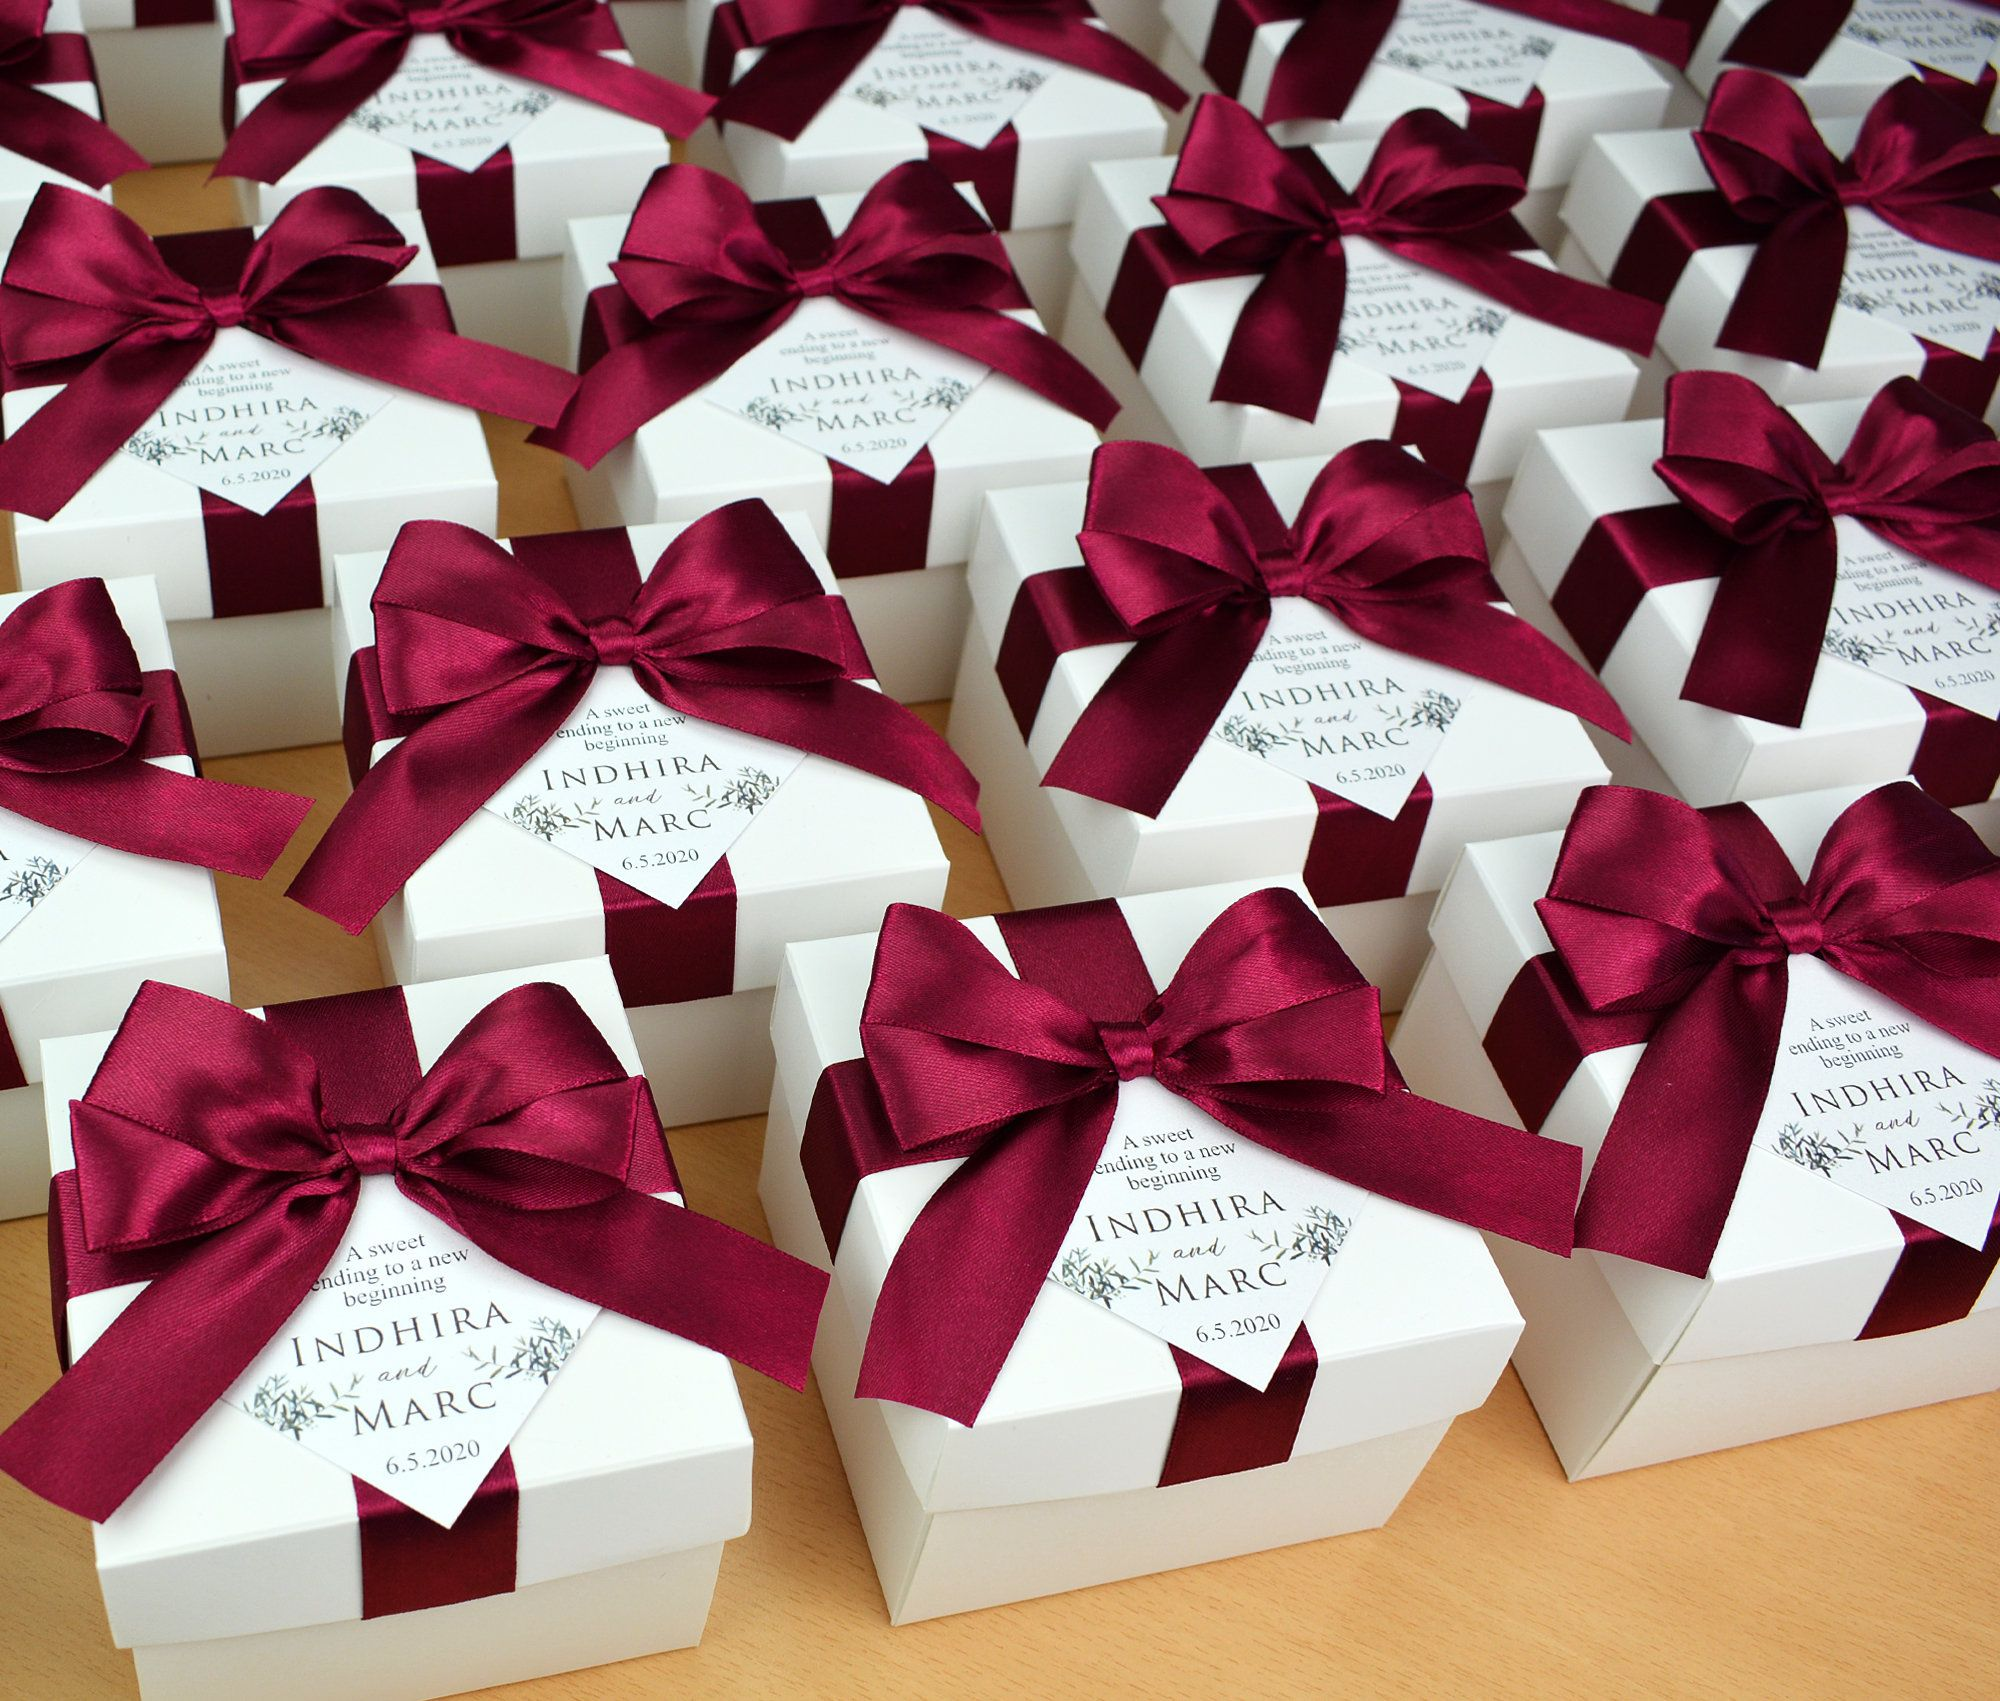 Elegant Wedding Favor Box With Wine Burgundy Satin Ribbon Bow Etsy In 2020 Wedding Favor Boxes Elegant Wedding Favors Wedding Gift Boxes